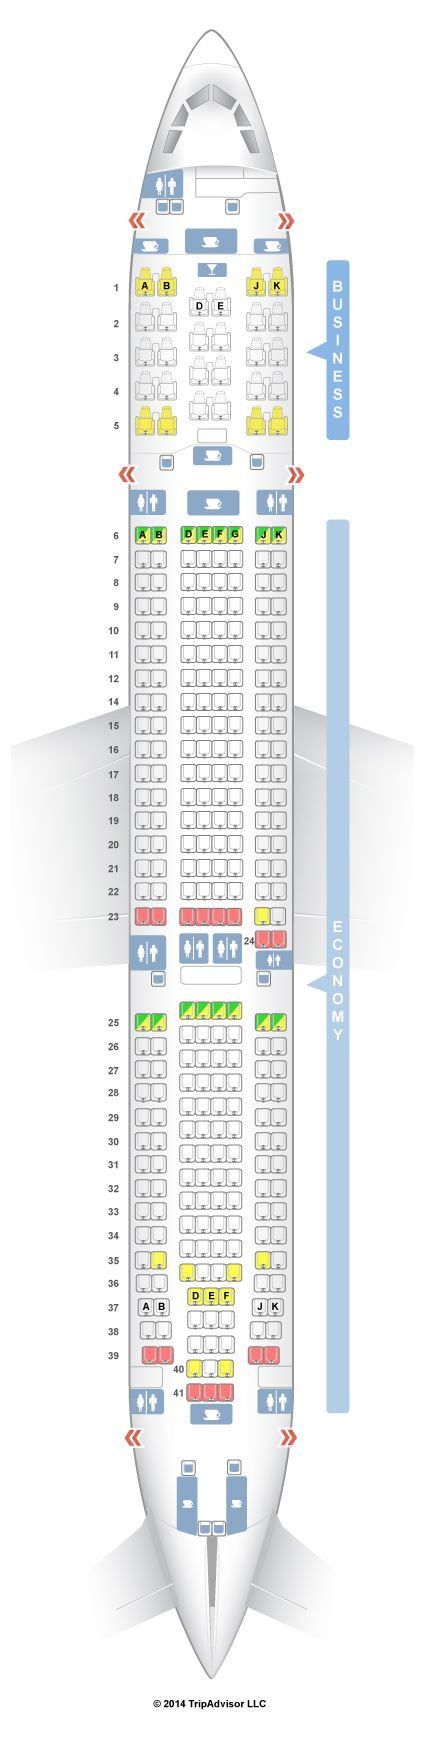 SeatGuru Seat Map Turkish Airlines Airbus A330-300 (333)